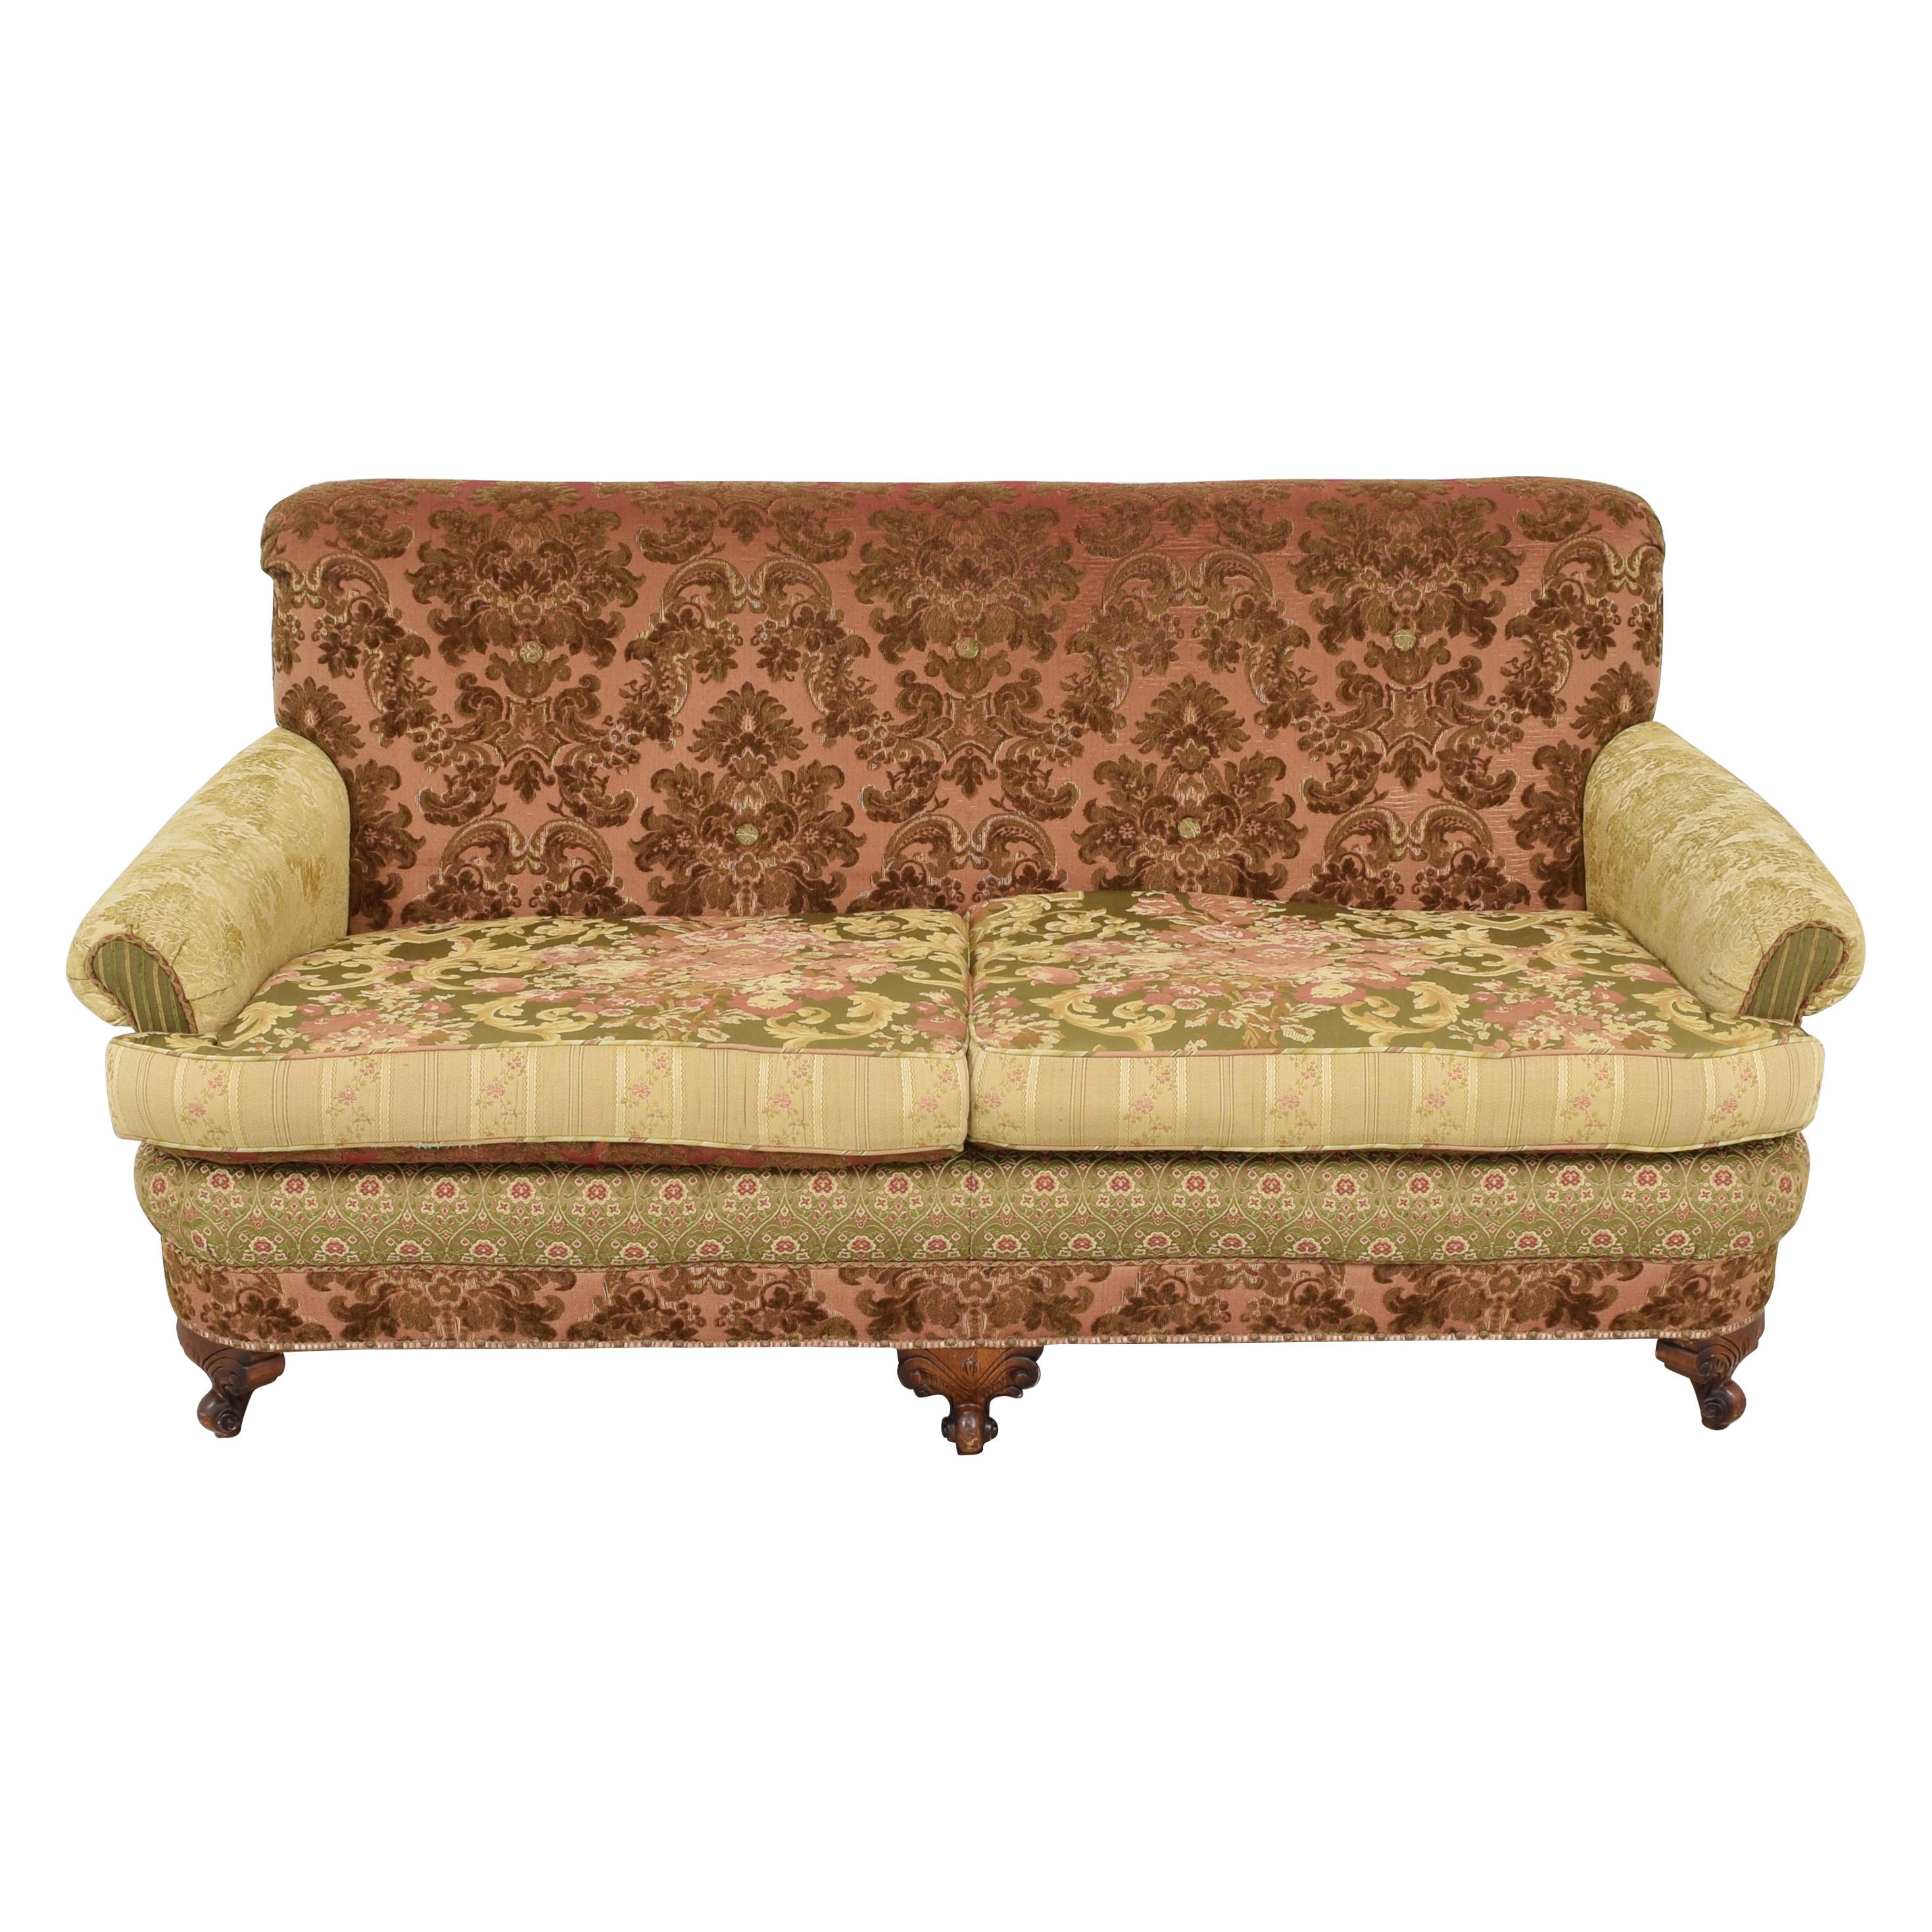 Key City Furniture Key City Jeff Zimmerman Victorian Sofa dimensions